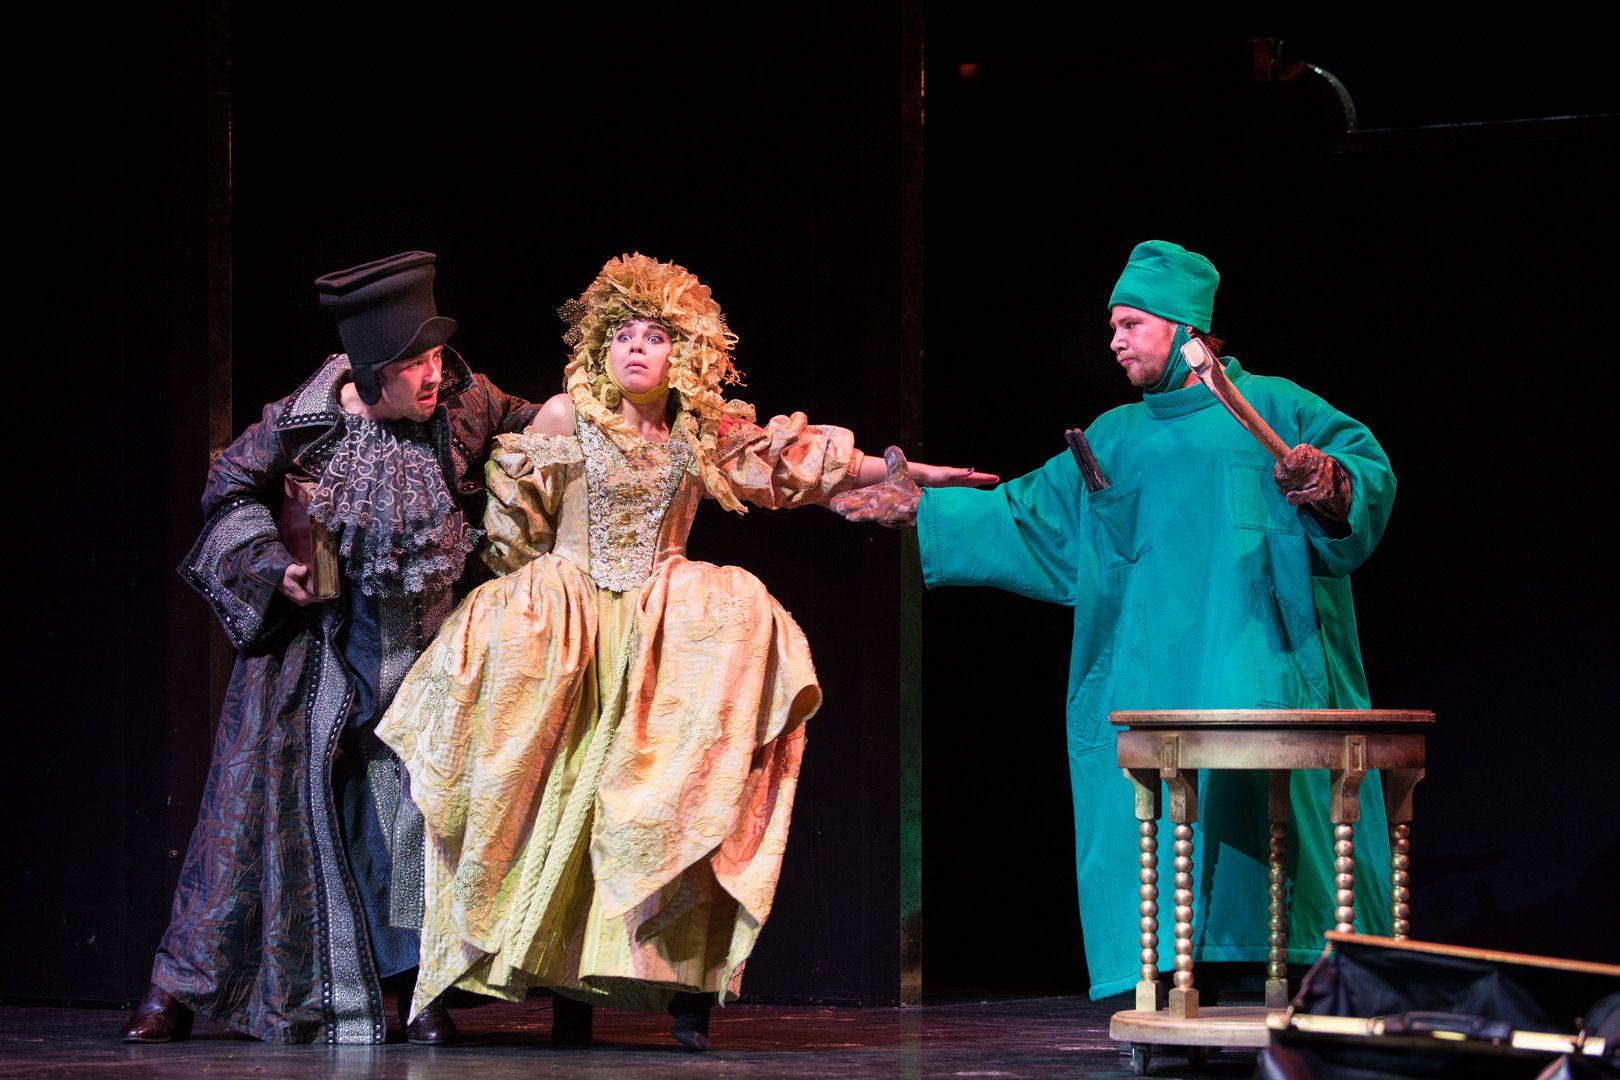 Спектакли «Плутни Скапена» и «Лекарь поневоле» в театре «Сатирикон» фото 4